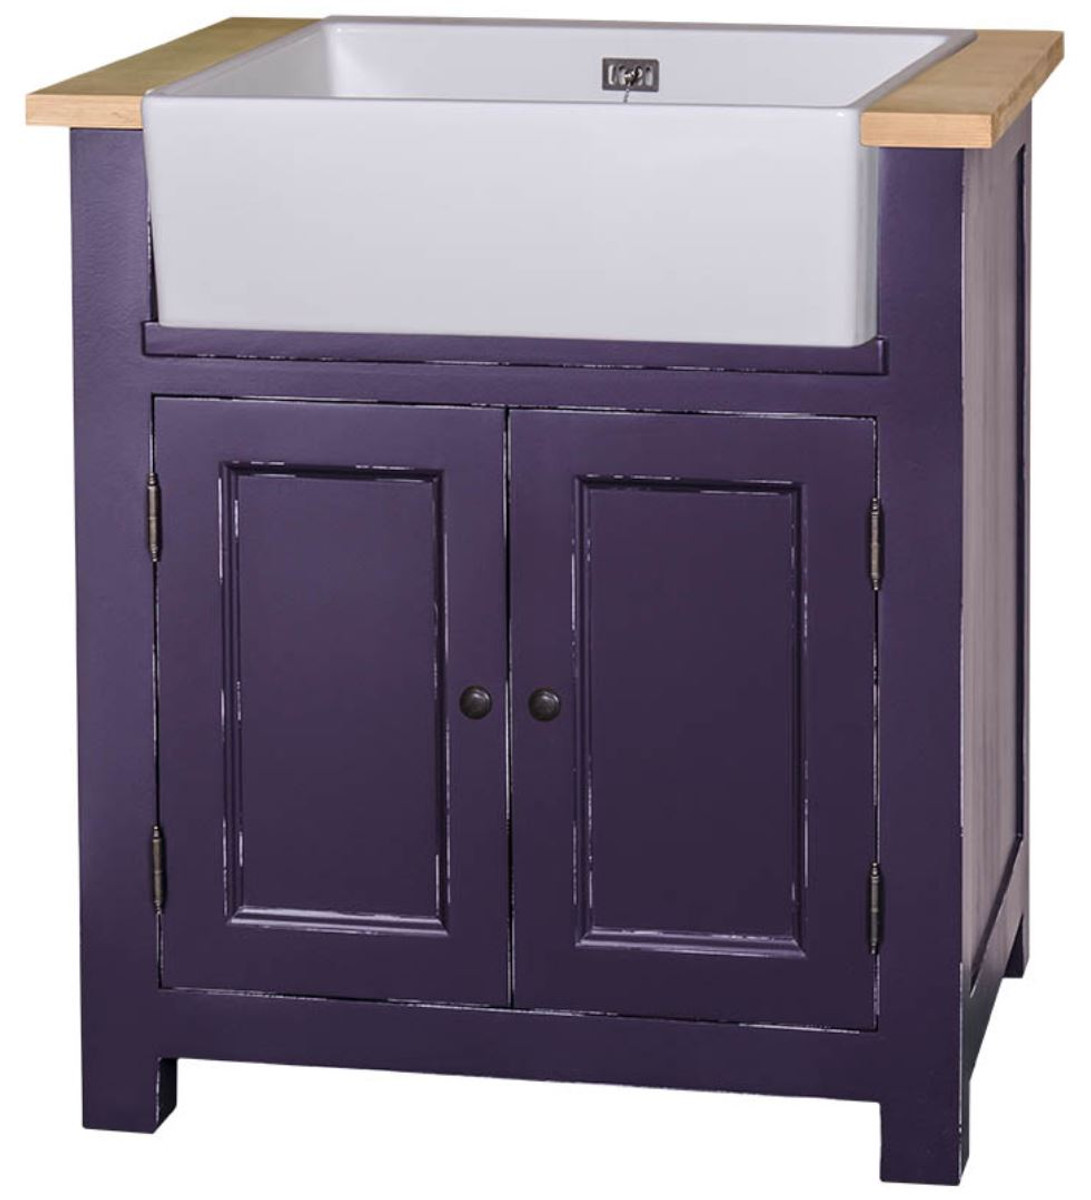 kuchenschranke lila casa padrino landhausstil sp ltisch sp lenschrank antik